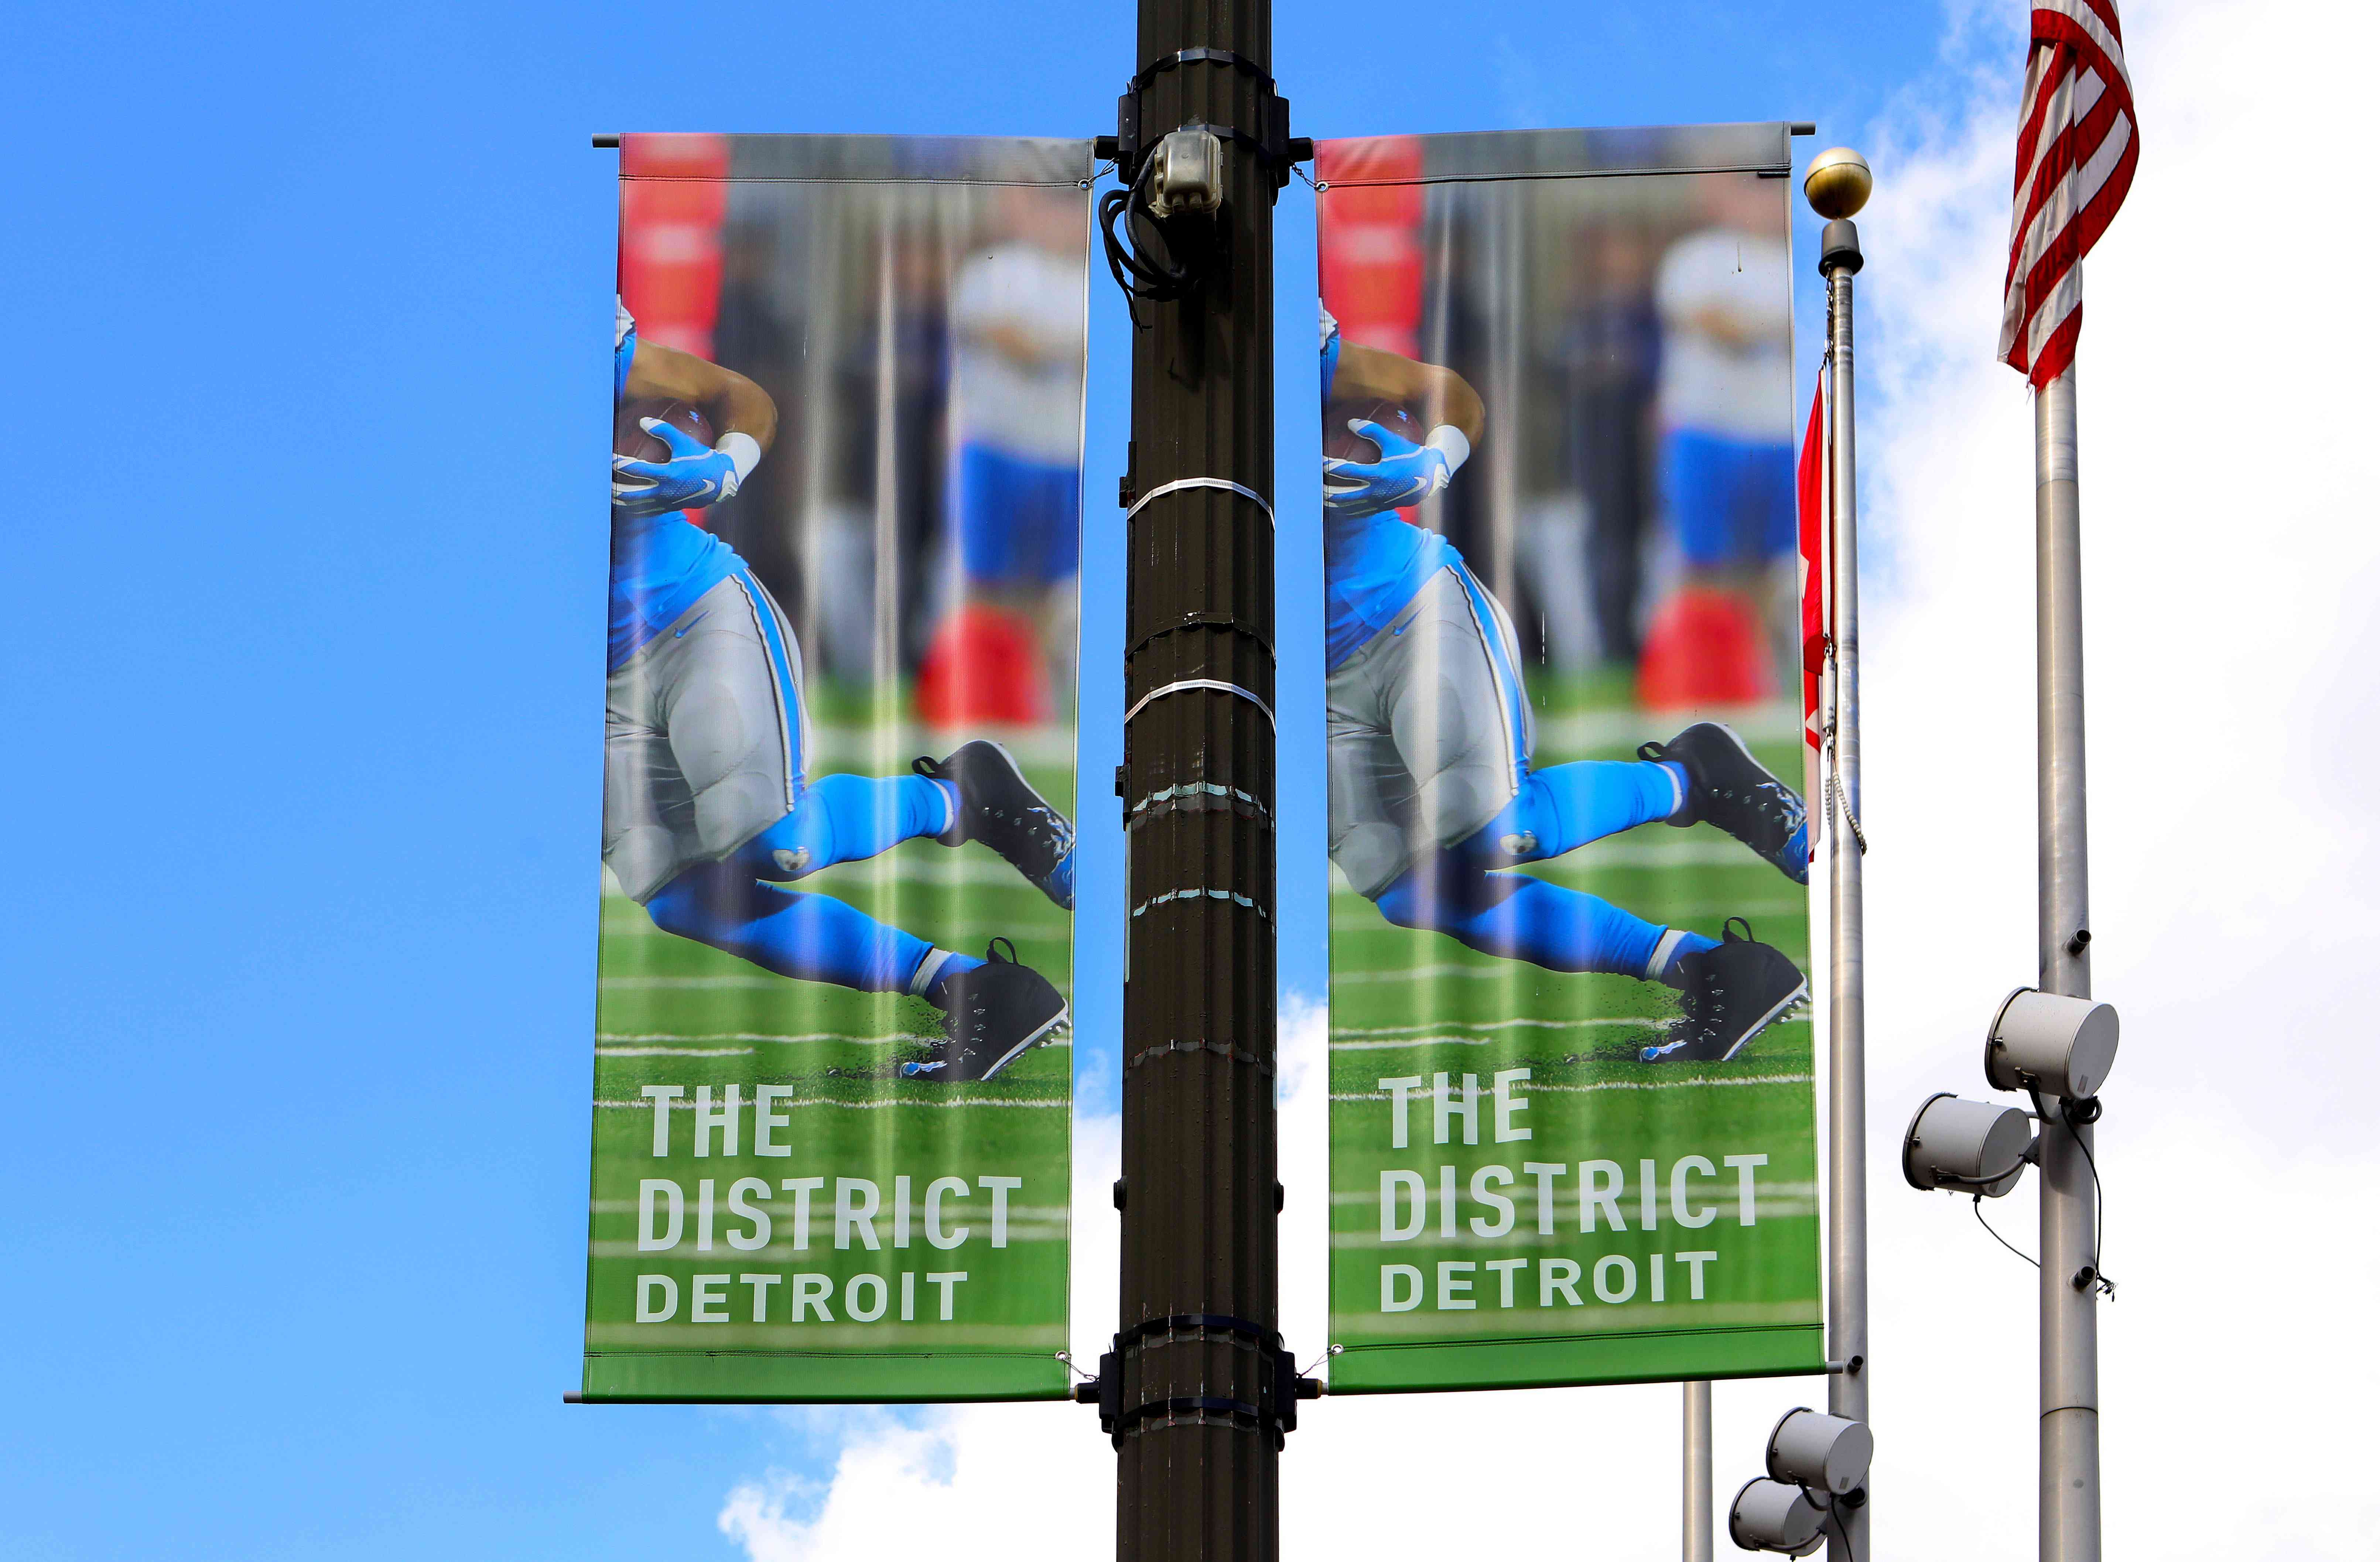 The District Detroit banner flies downtown in Detroit, Michigan